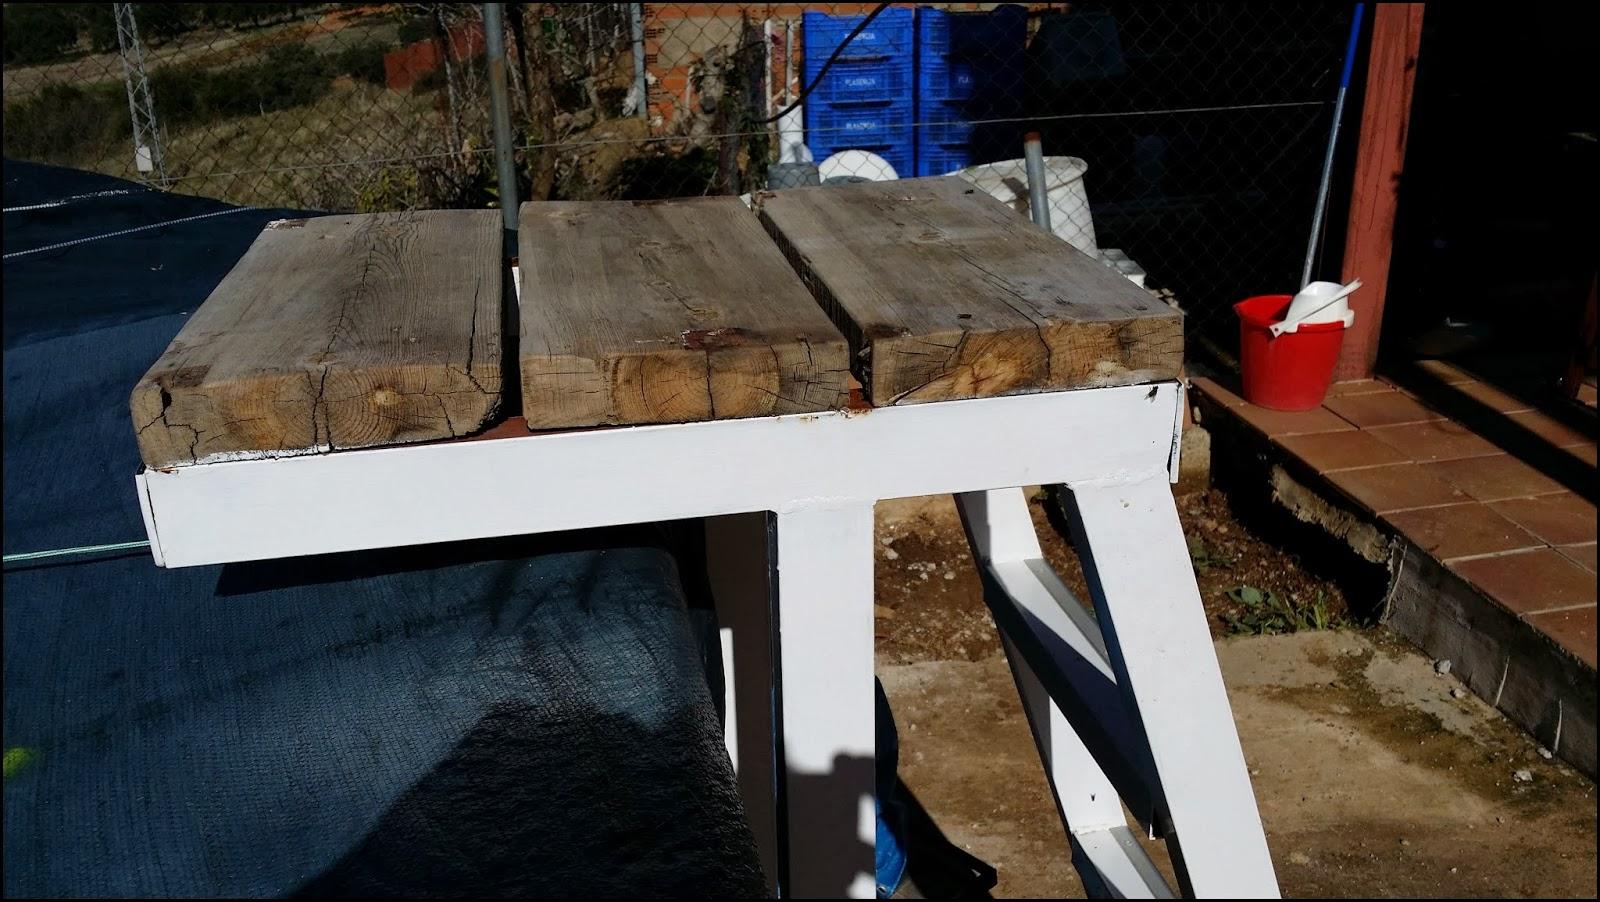 Inventandolo escalera piscina desmontable for Construir escalera piscina